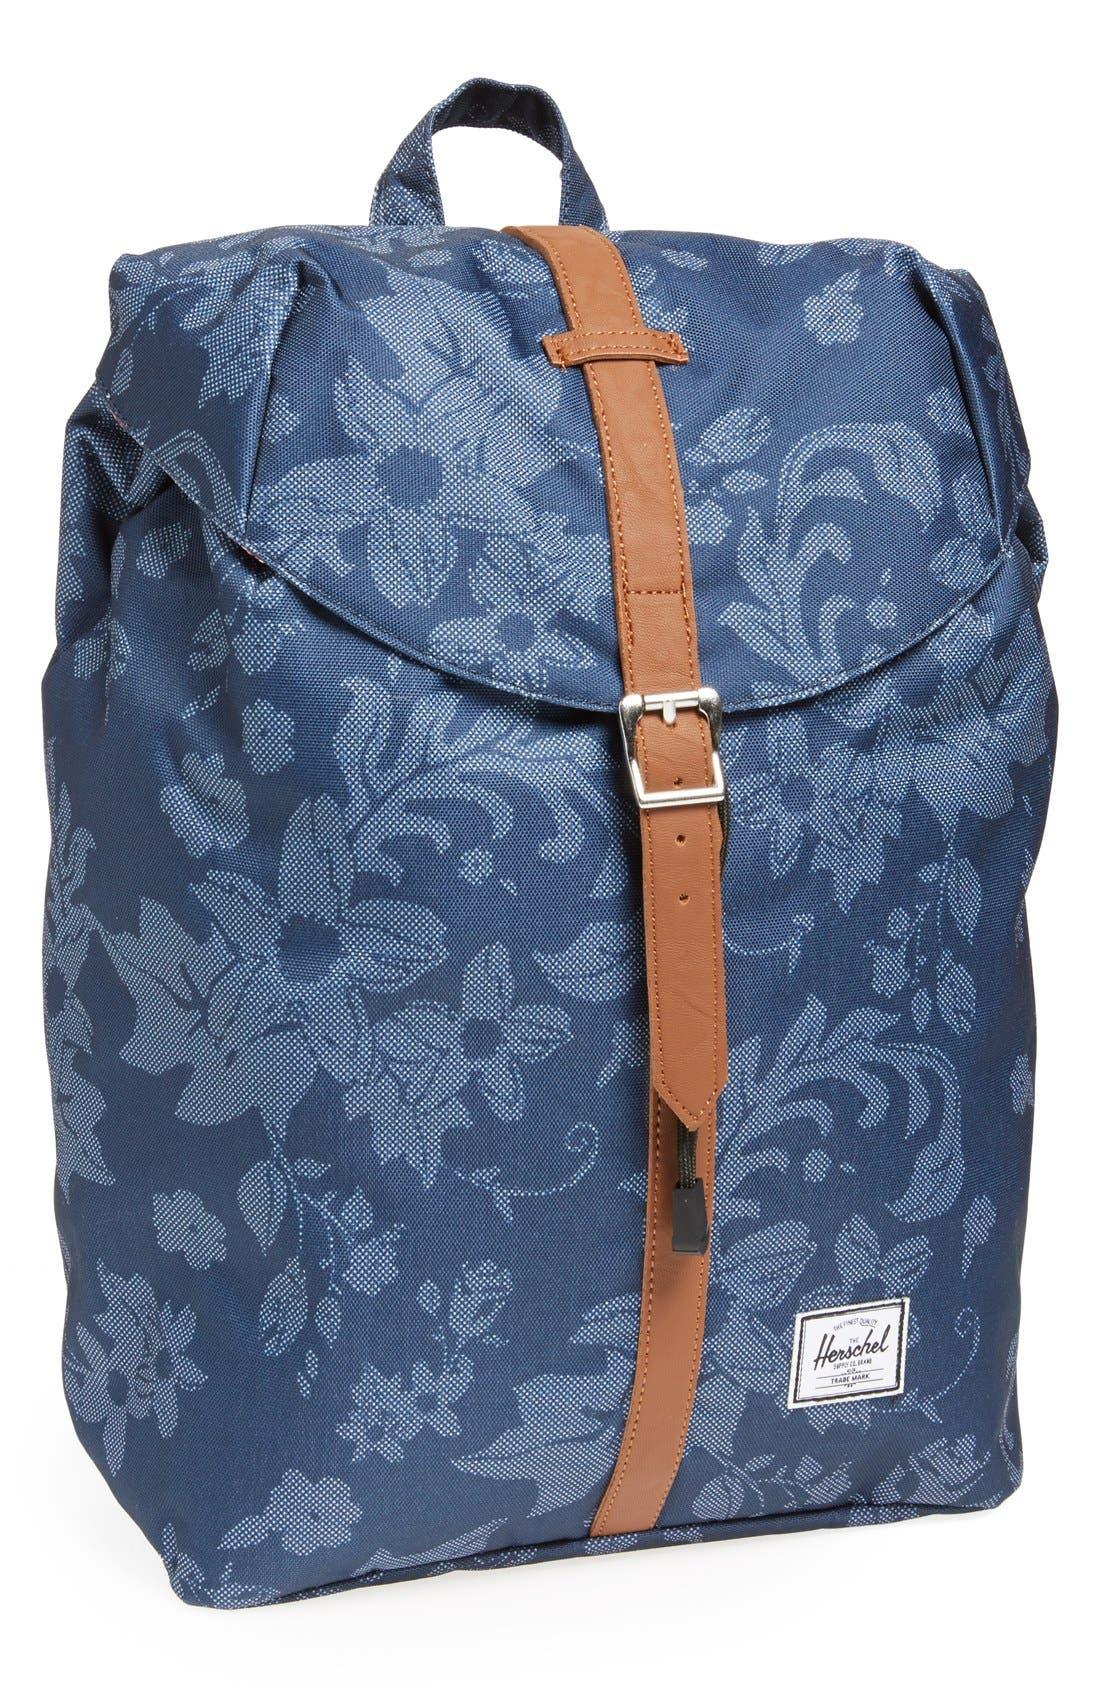 Alternate Image 1 Selected - Herschel Supply Co. 'Post- Mid Volume' Backpack